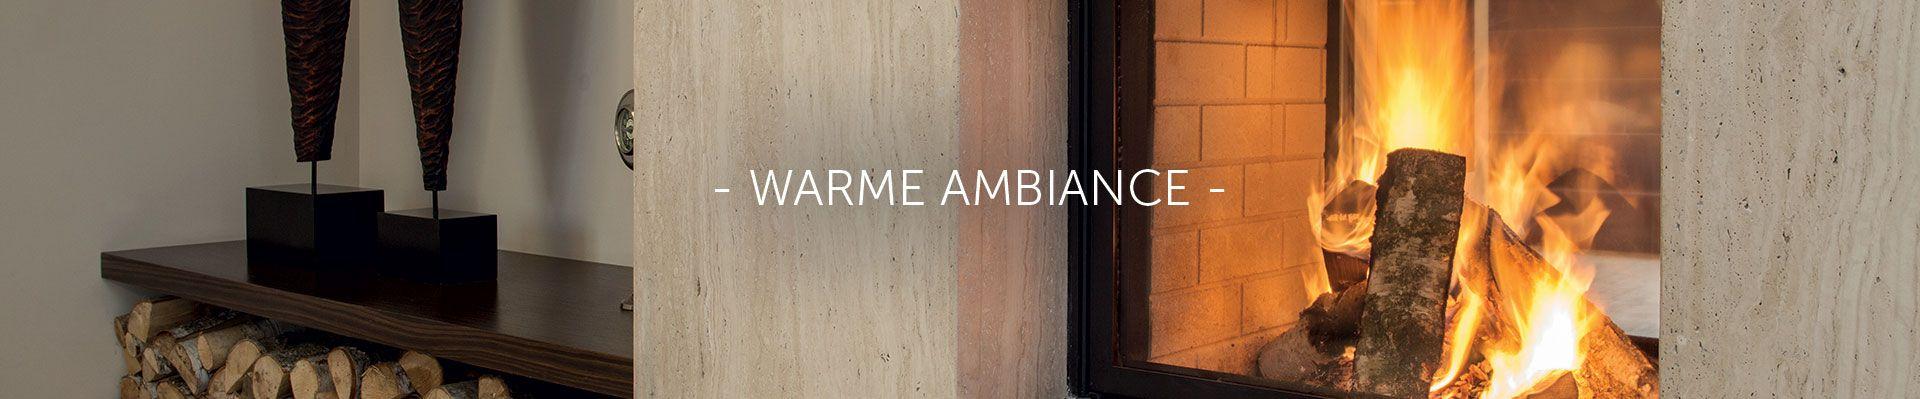 Warme ambiance